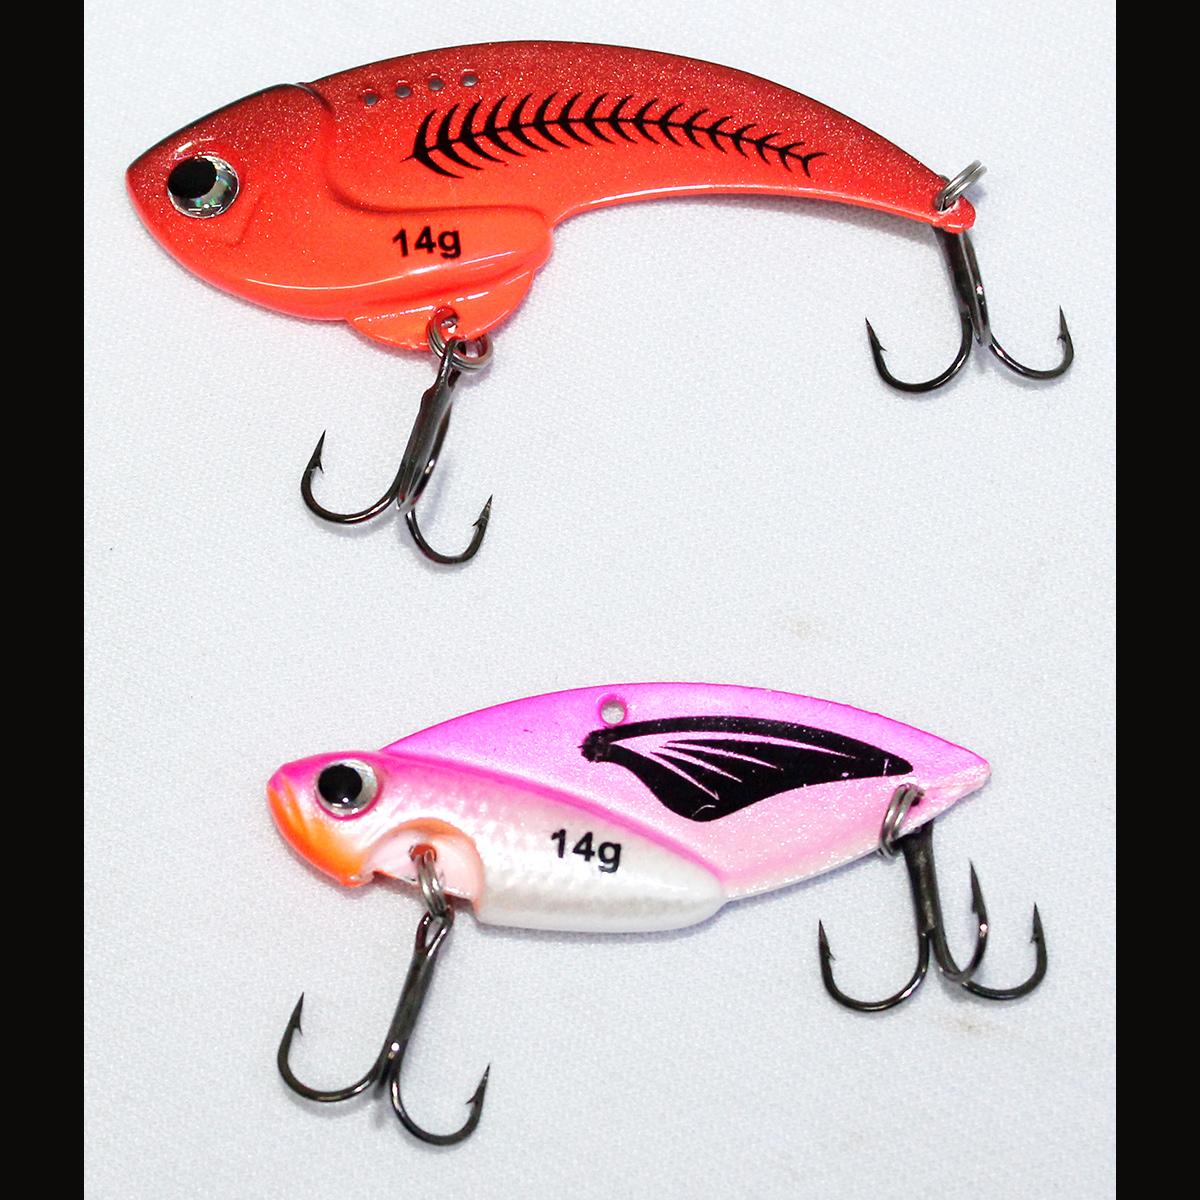 Mồi Câu Cá Giả - Cá Sắt Fishens - Cicada - Mồi Thìa Câu Lure Lóc 14g